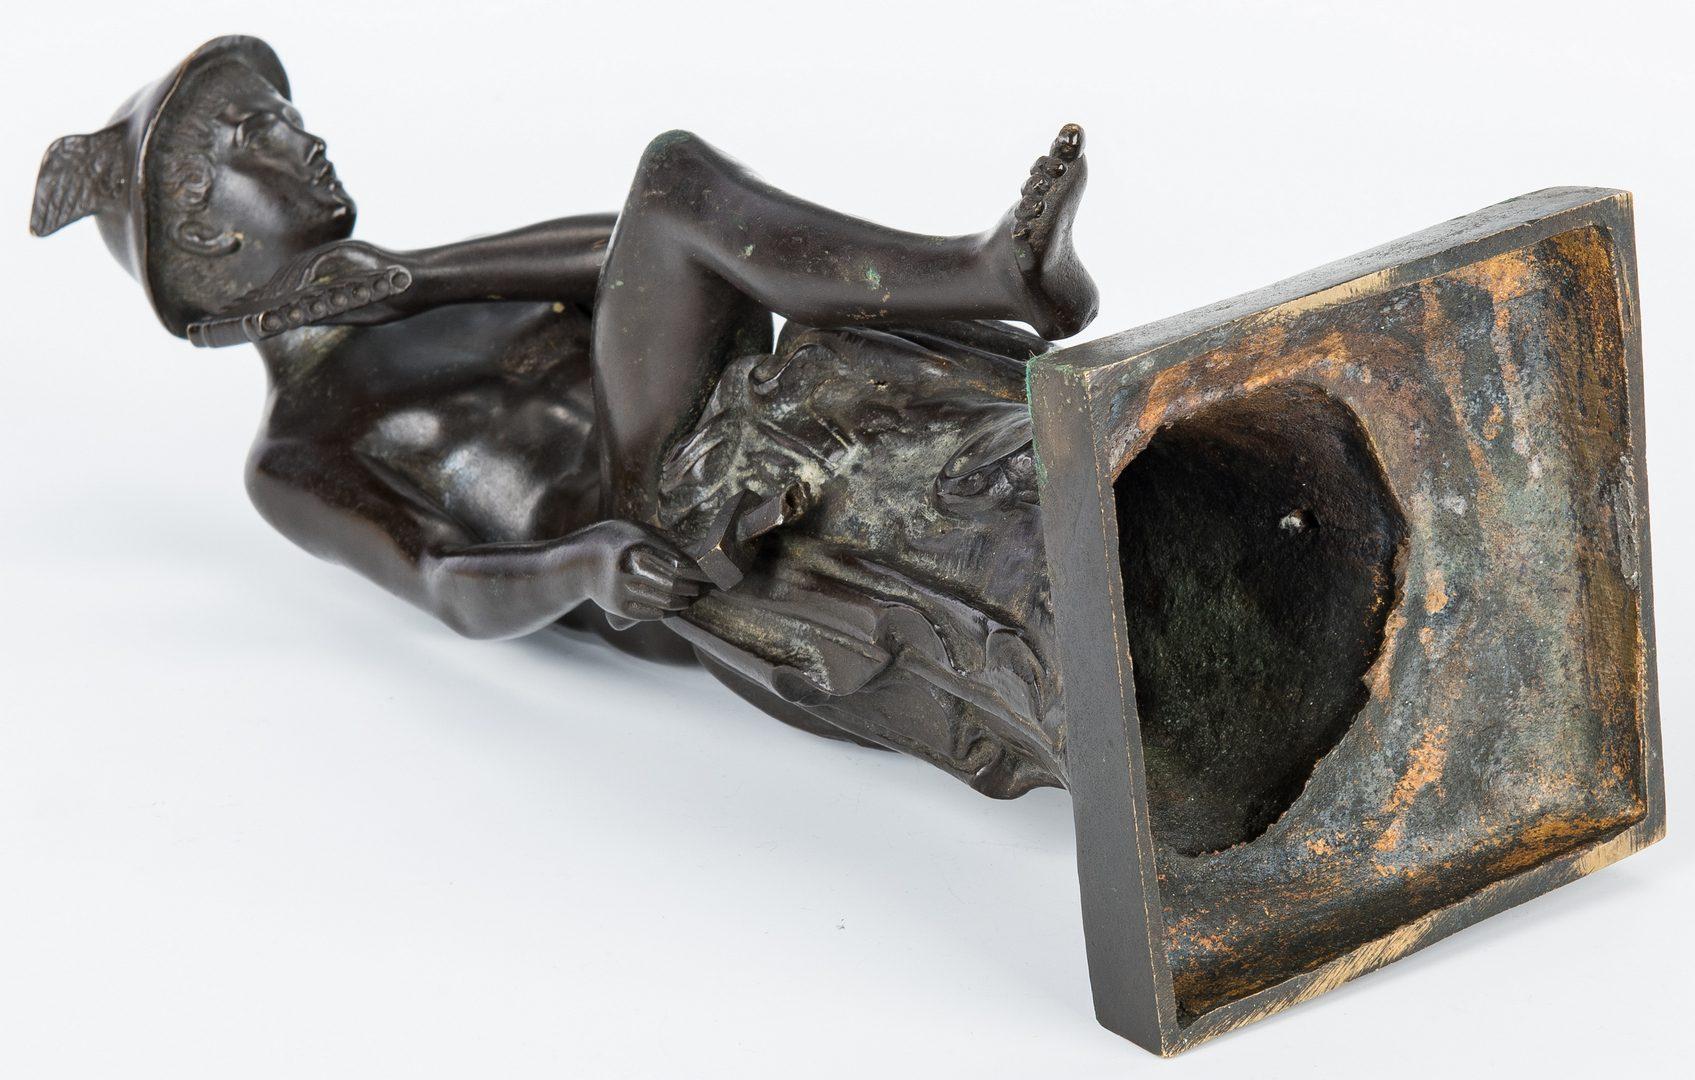 Lot 152: 2 Sculptures incl. Hermes Bronze and Bill Lett Knight